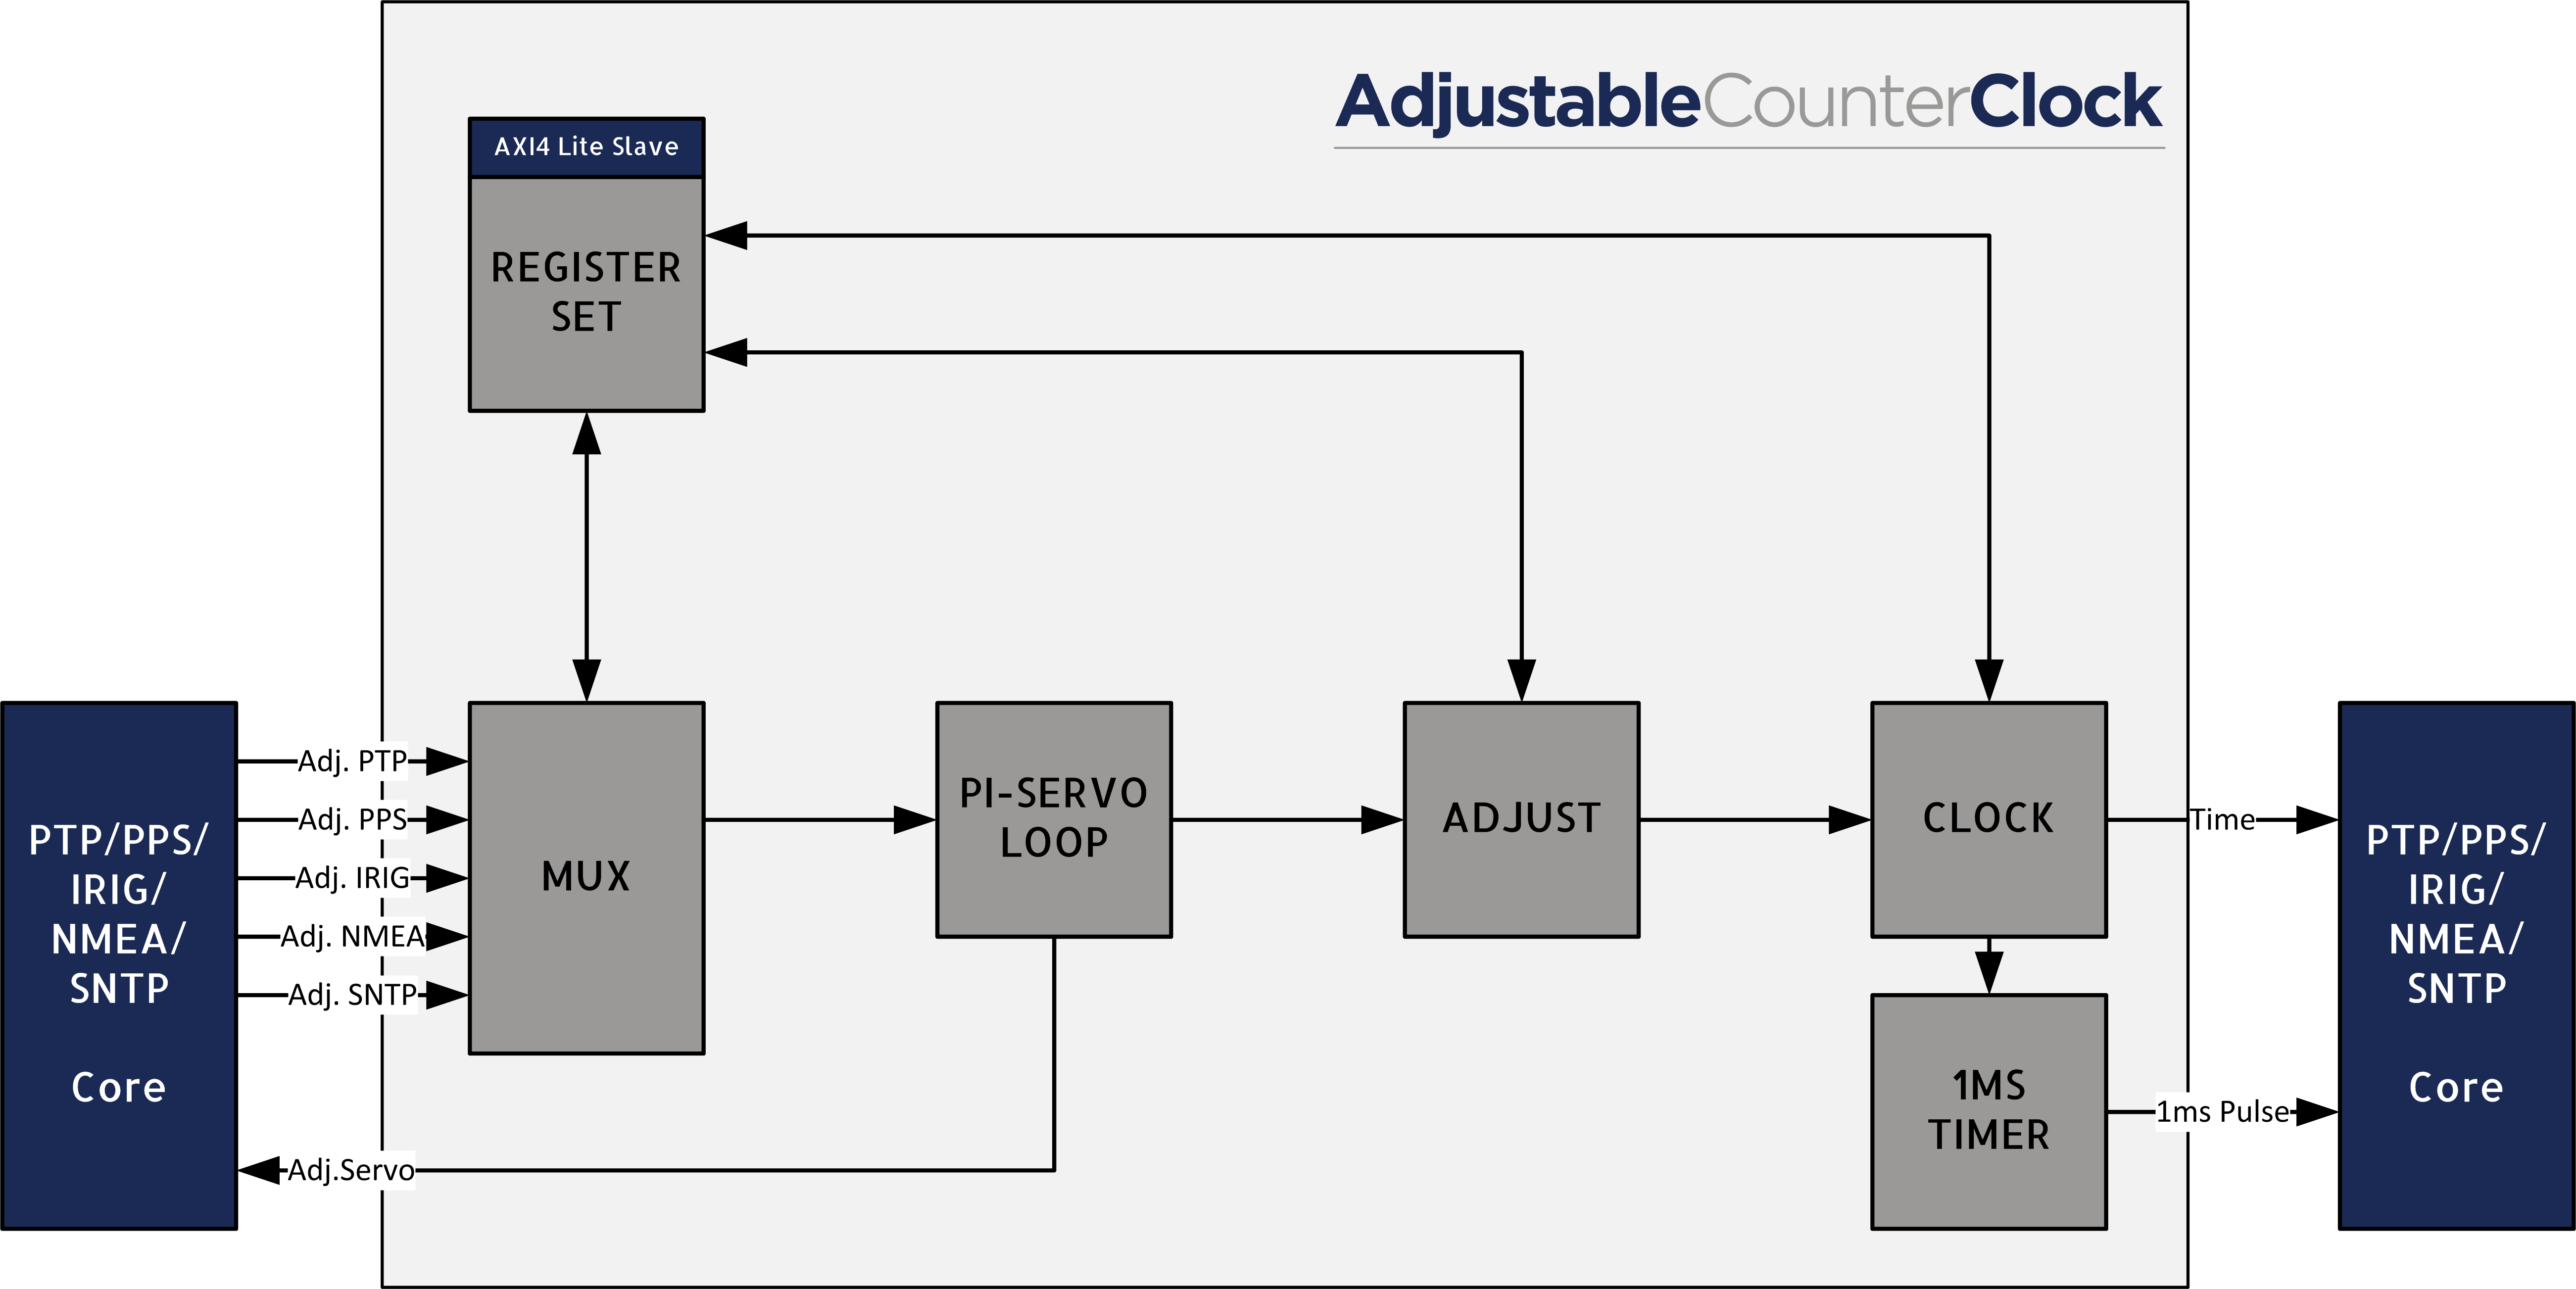 NetTimeLogic GmbH - Adjustable Clock